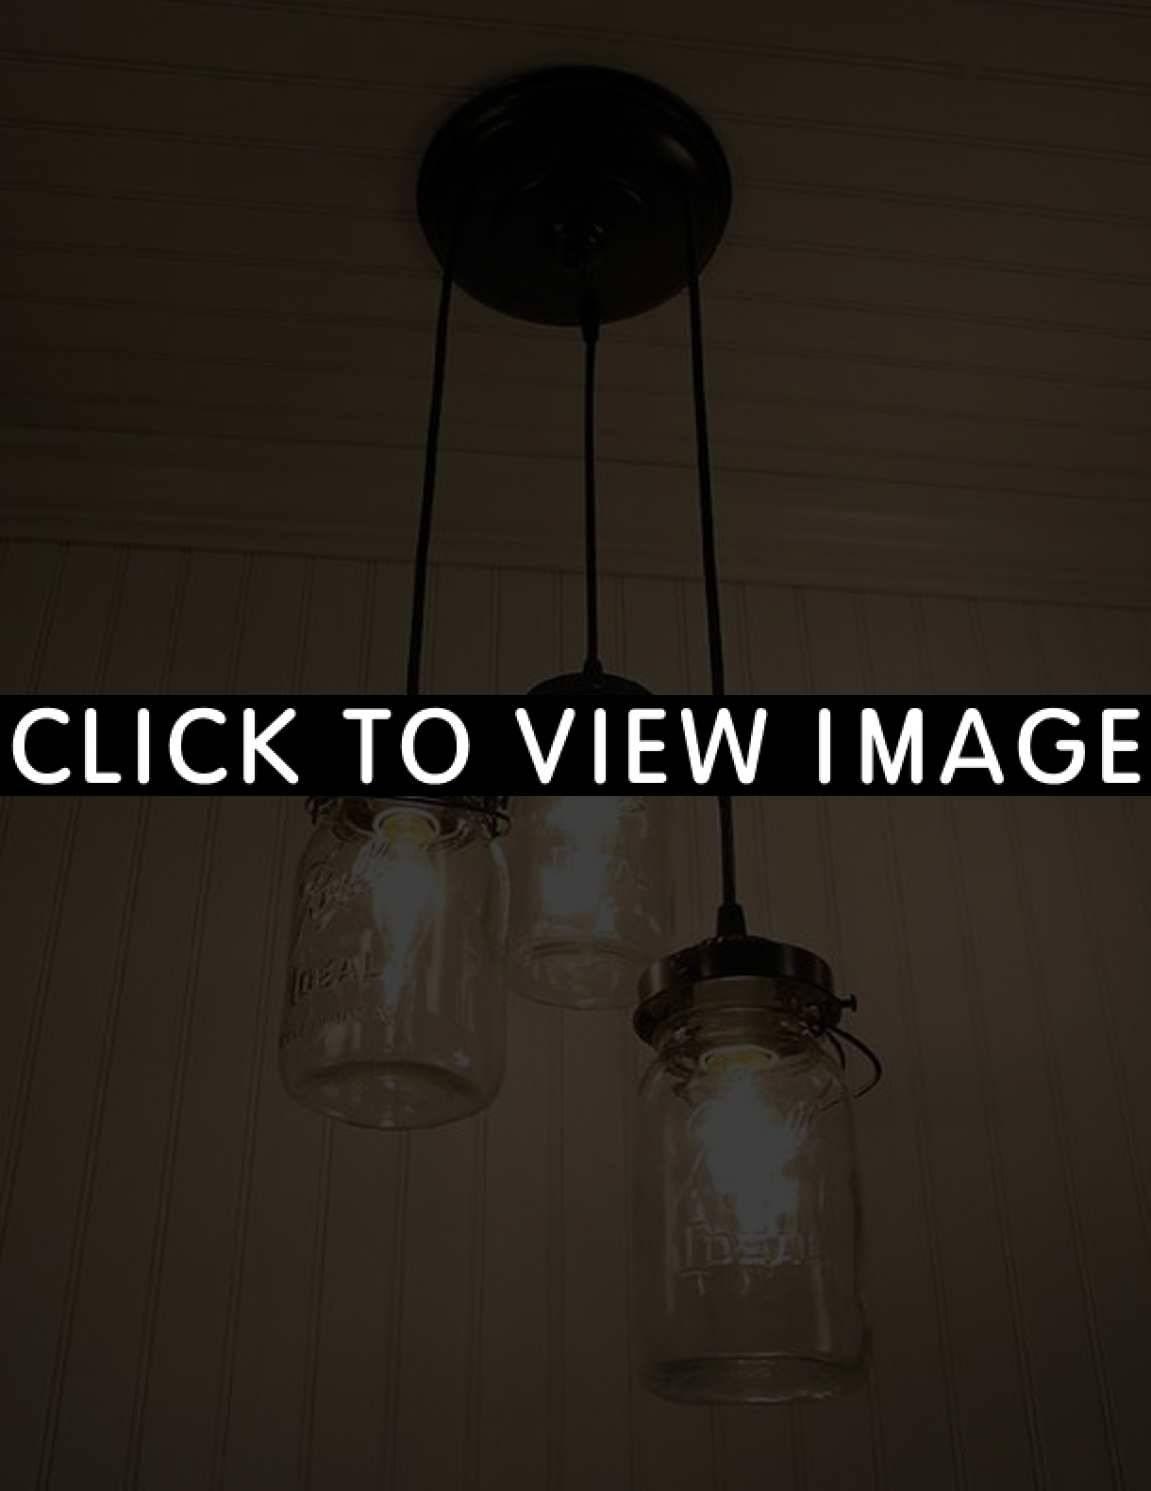 Multiple Pendant Lighting Fixtures. Bulbs Multiple Pendant Lights with regard to Multiple Pendant Lighting Fixtures (Image 12 of 15)